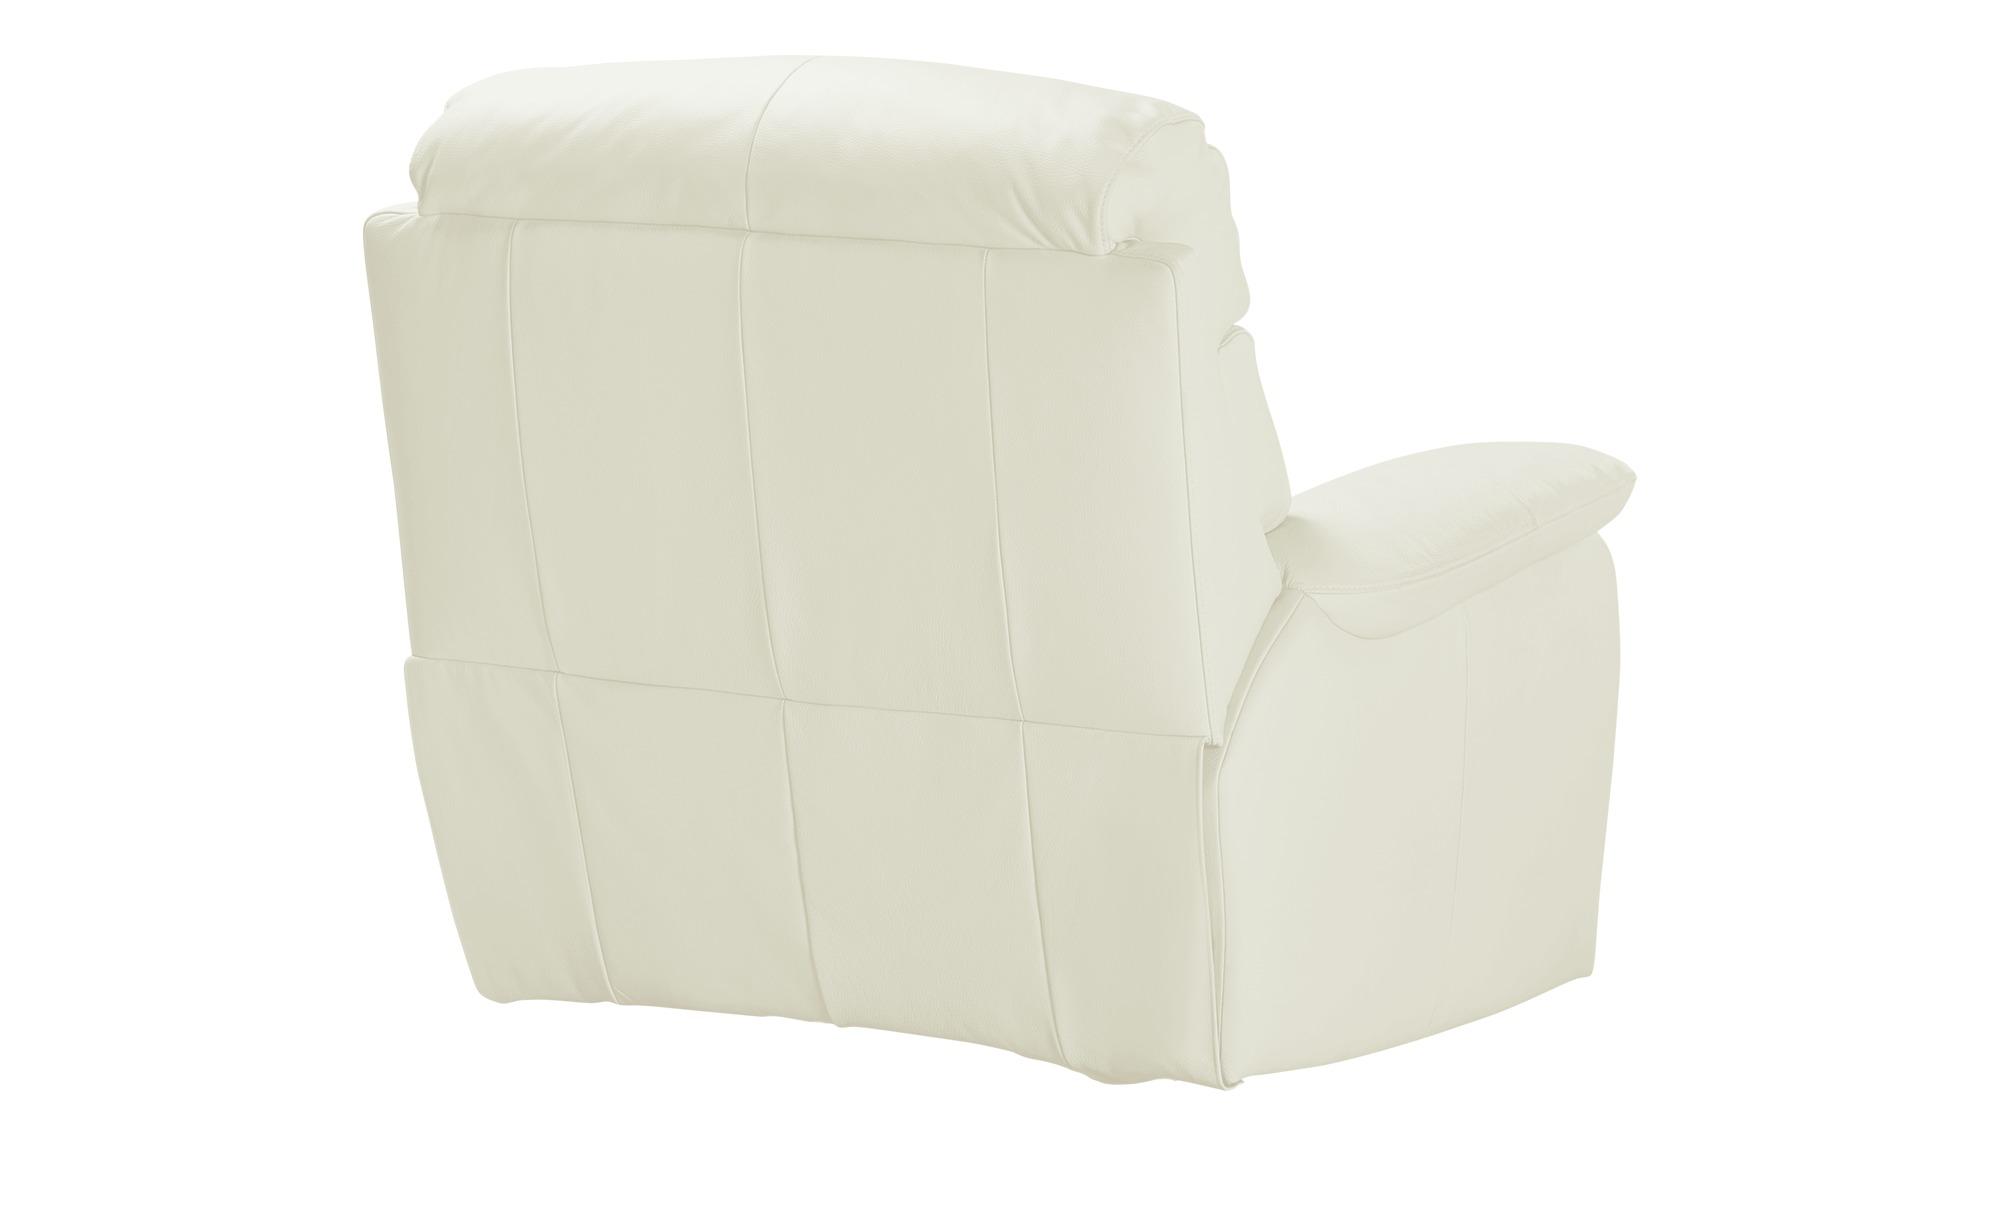 Wohnwert Weißer Ledersessel  Ambra ¦ weiß ¦ Maße (cm): B: 106 H: 102 T: 102 Polstermöbel > Sessel > Ledersessel - Höffner